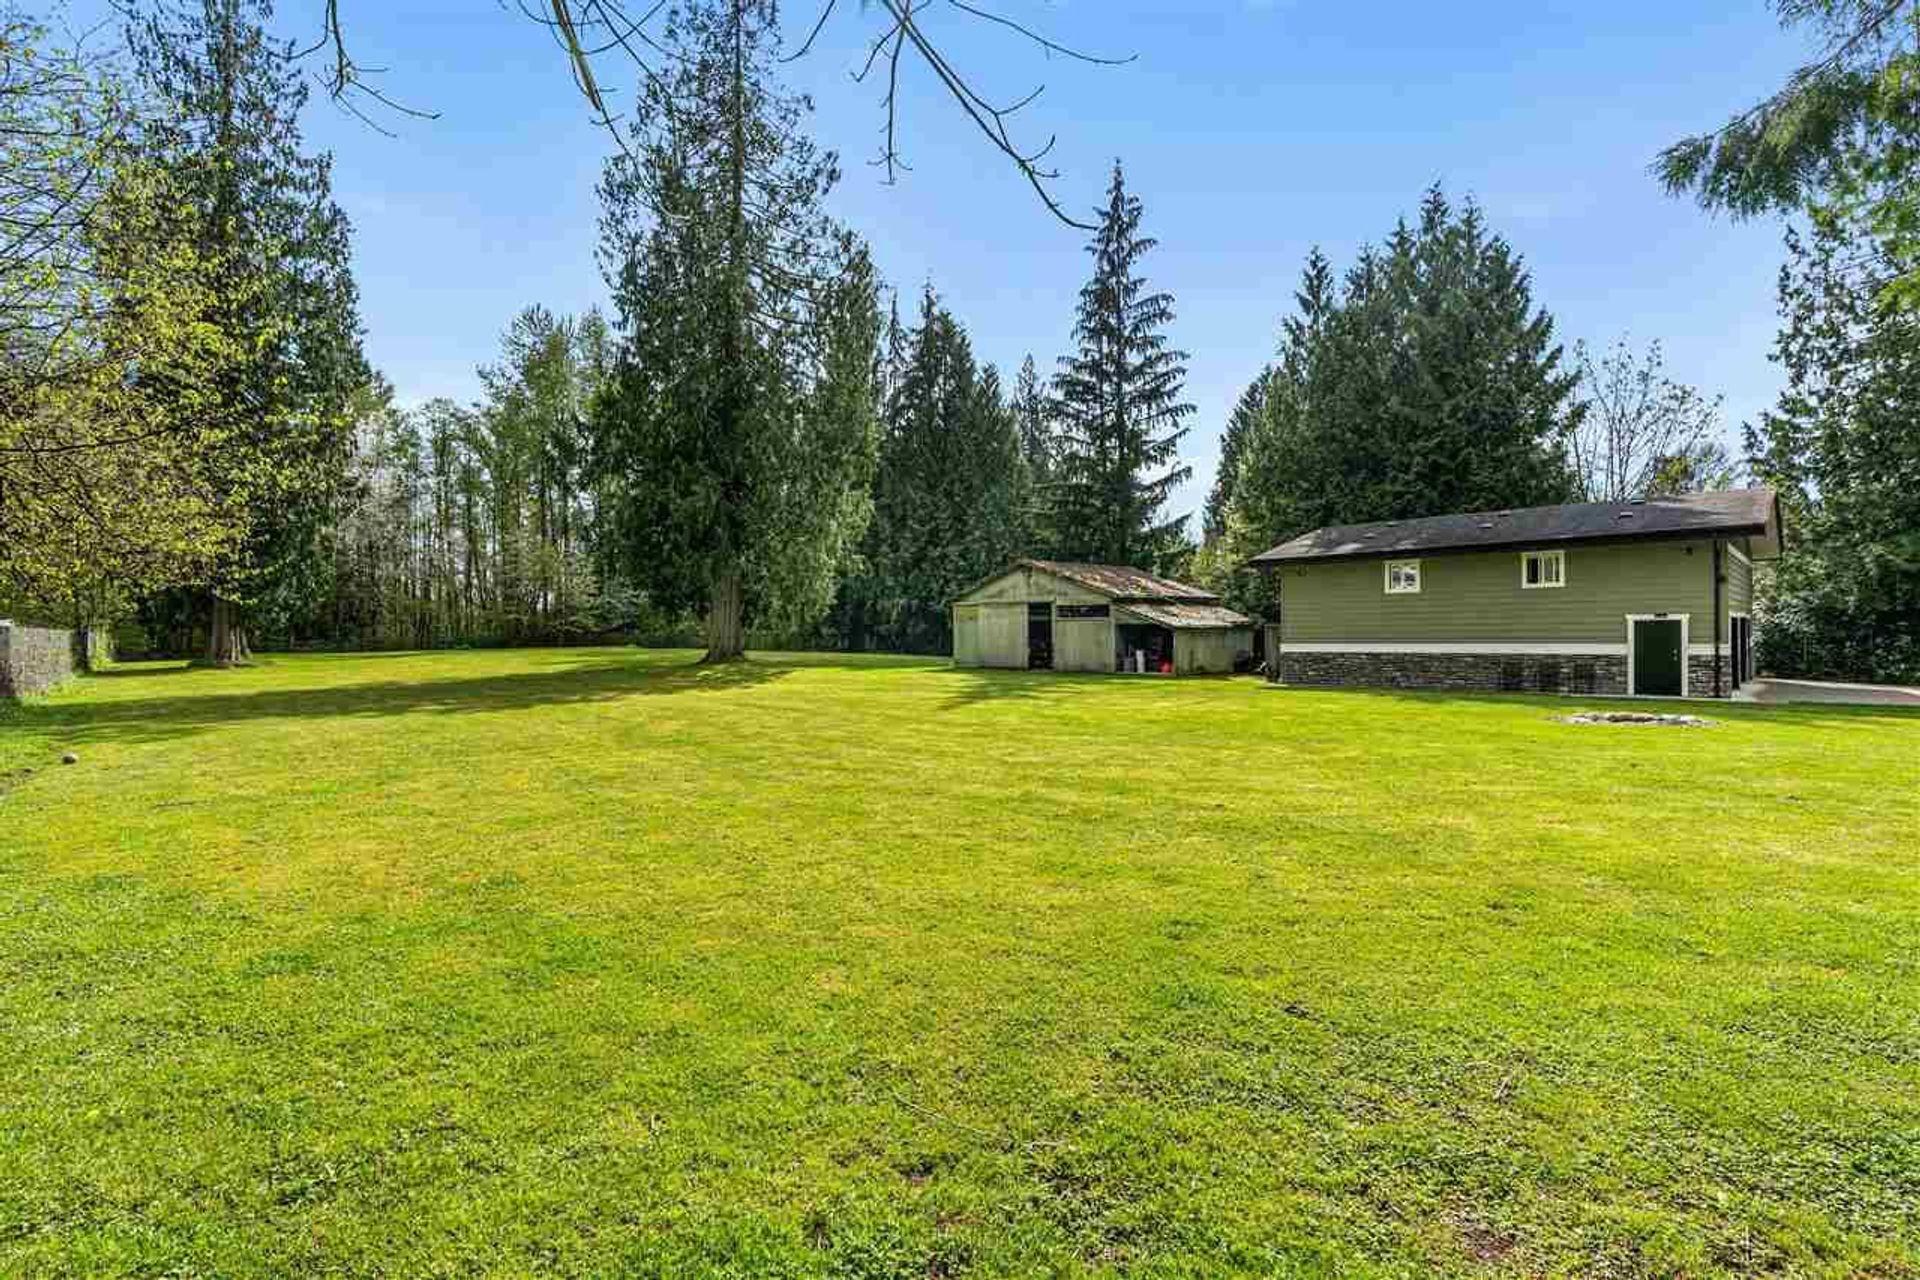 24852-ferguson-avenue-cottonwood-mr-maple-ridge-40 of 24852 Ferguson Avenue, Cottonwood MR, Maple Ridge